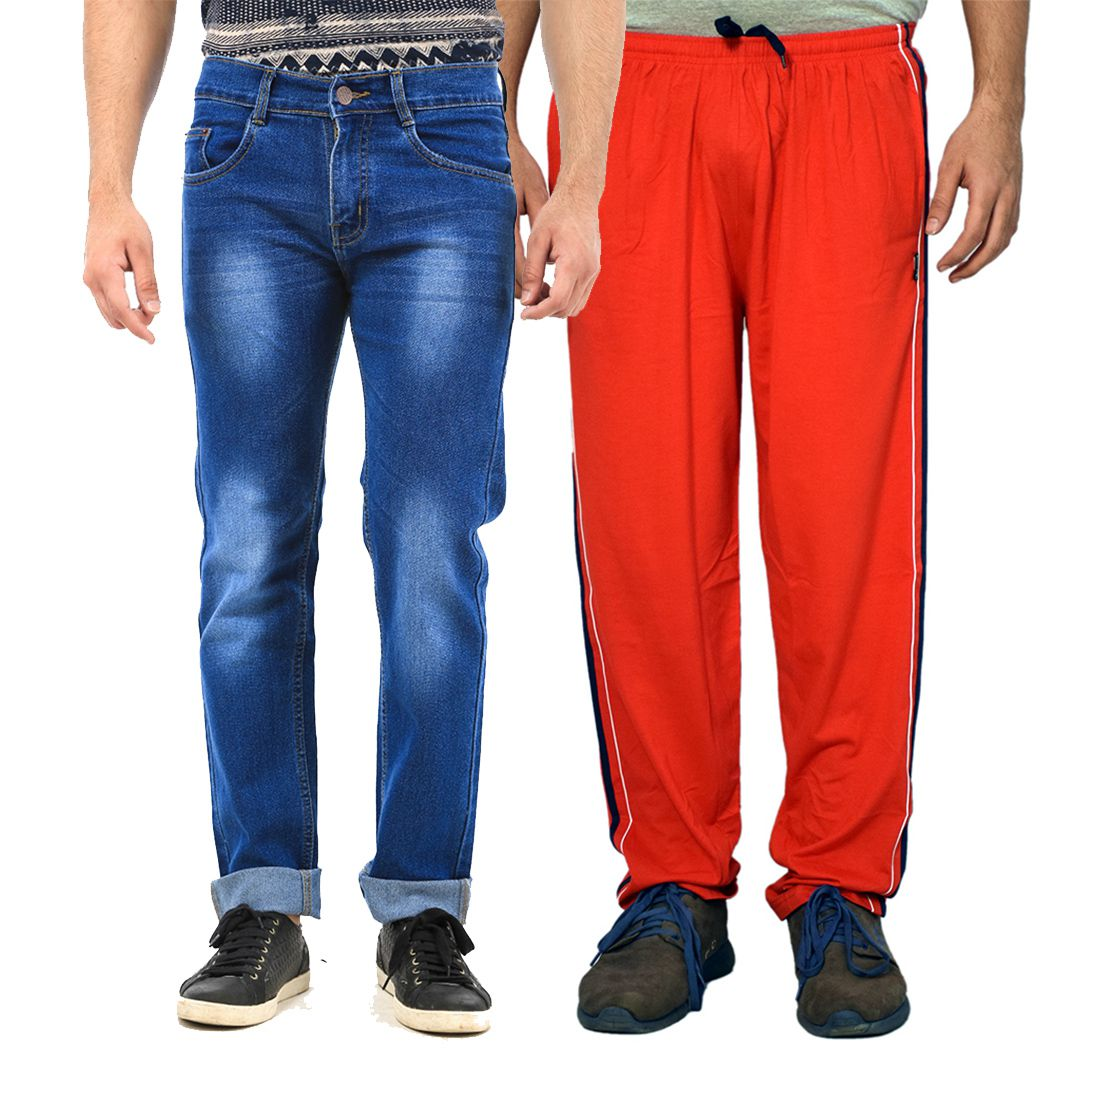 Van Galis Multicolored Regular Fit Washed